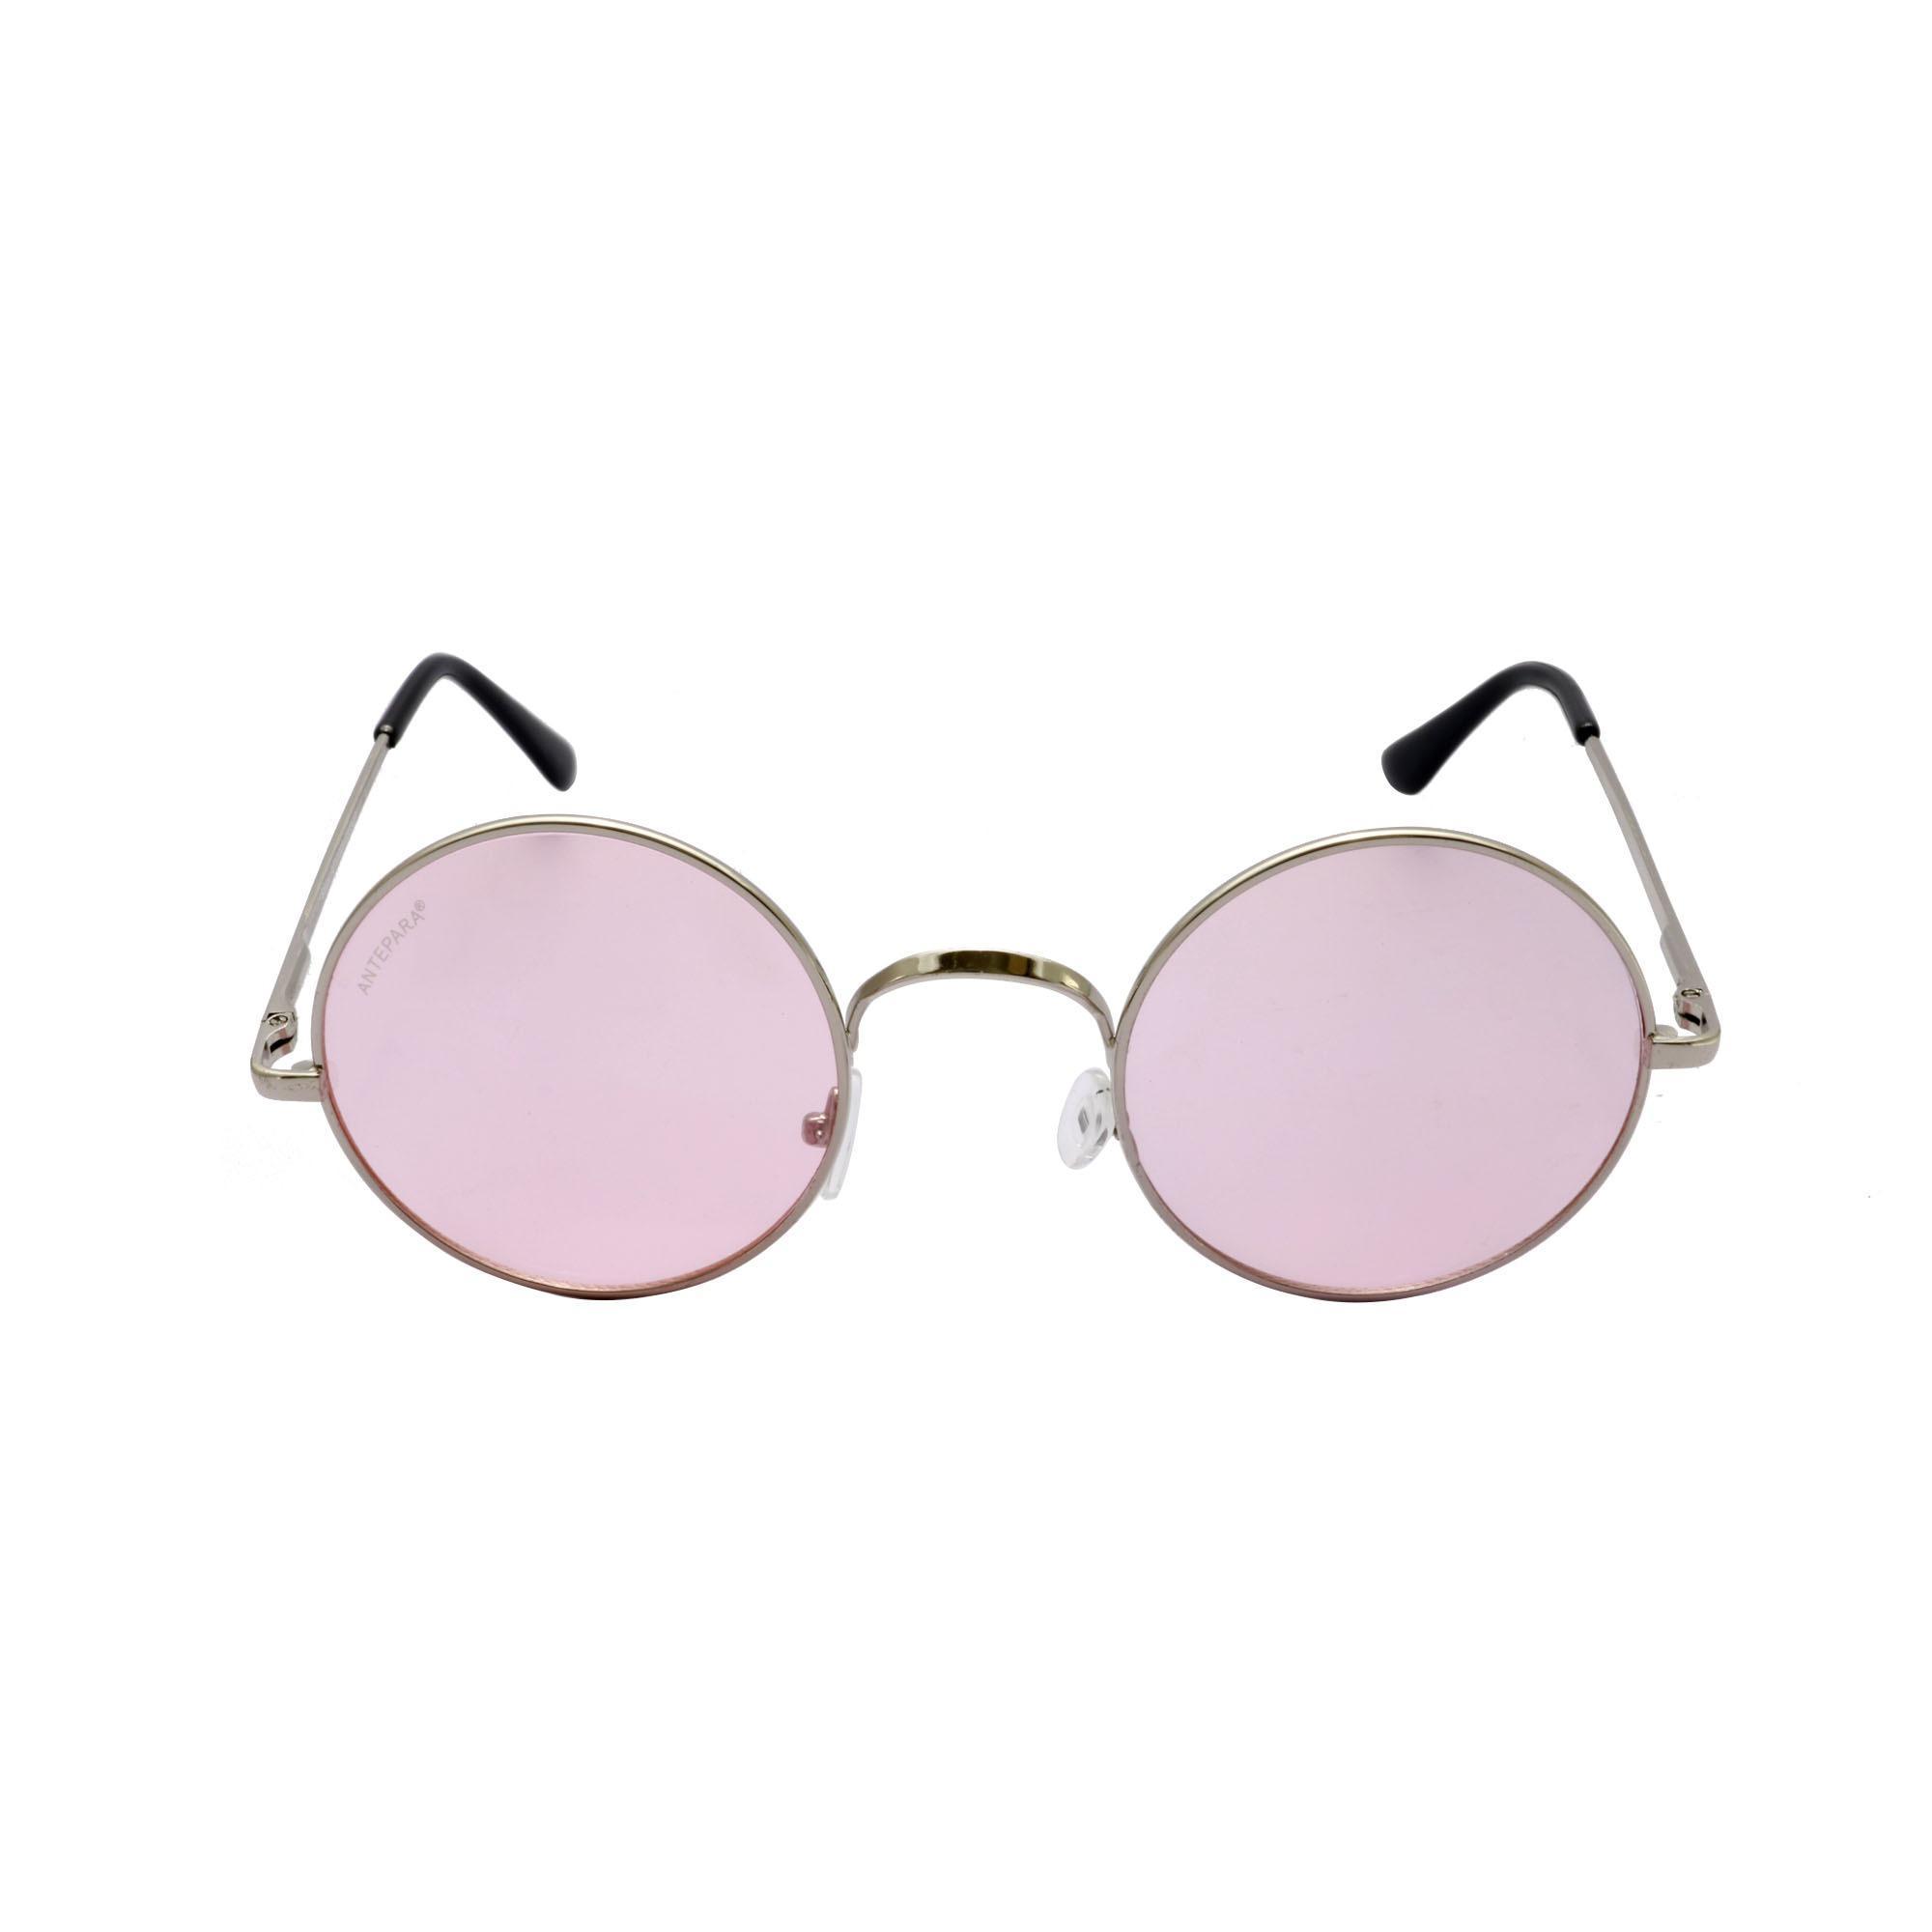 2f7c1c4dba1 Philippines. Savoy AP10785 C203GP Round Women Sunglasses (Silver Frame